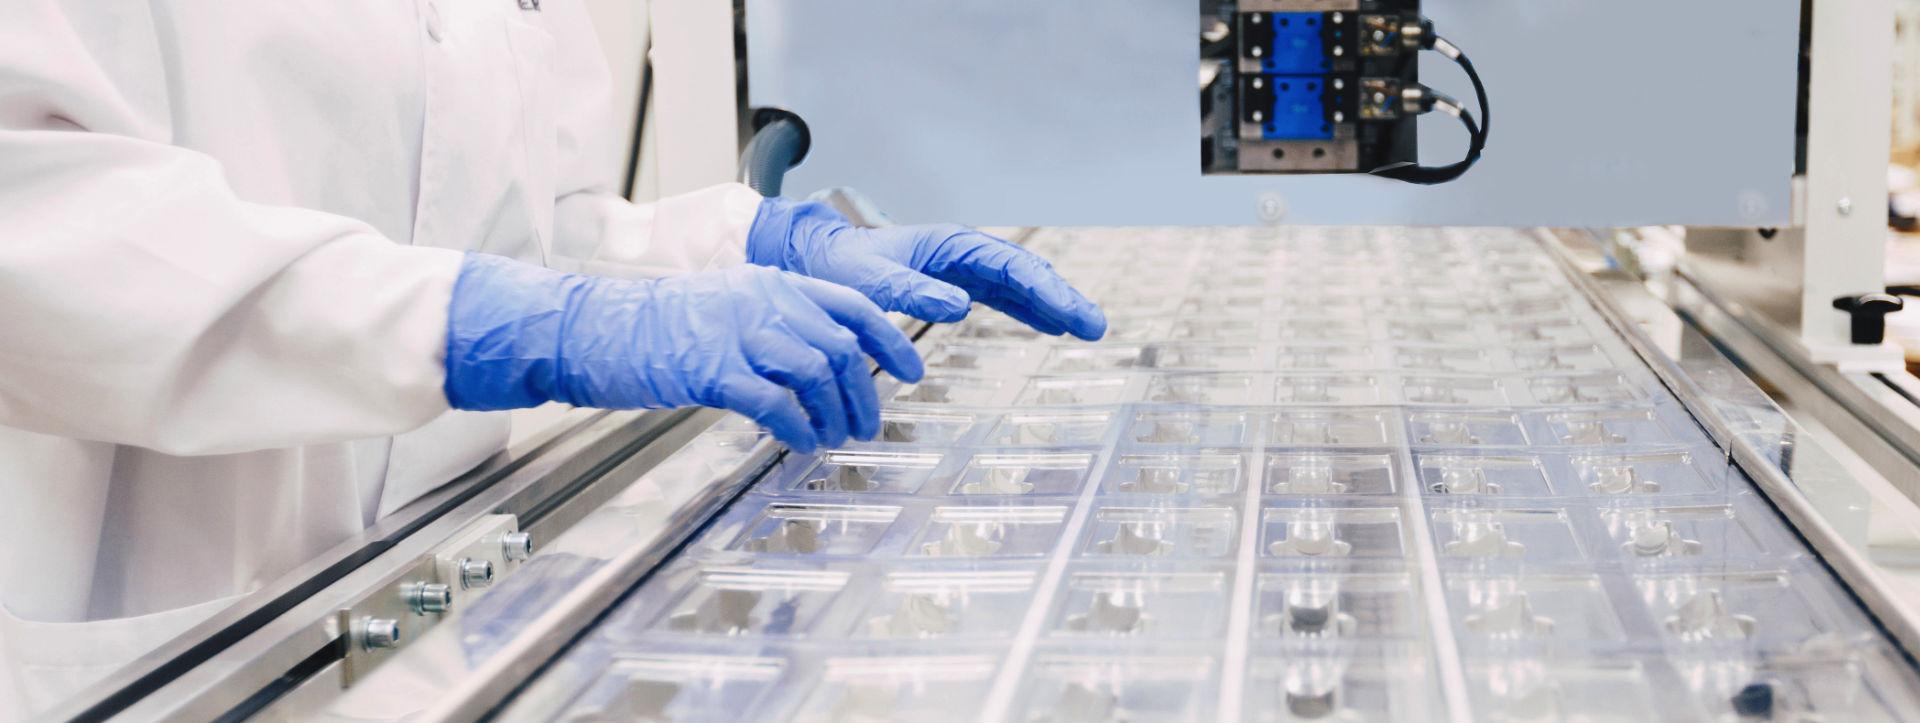 Medical blister packaging hamer medical